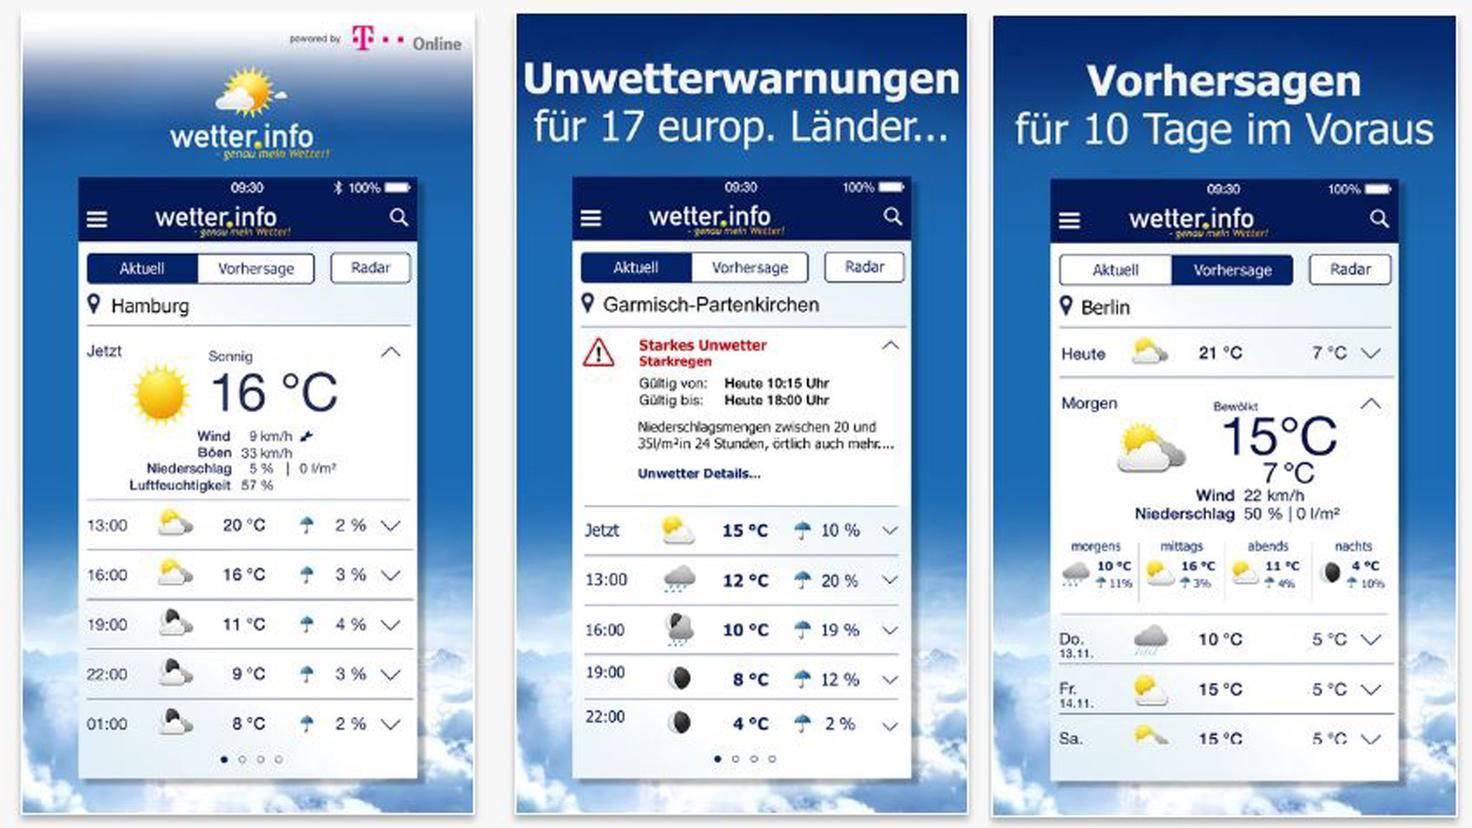 Wetter-info-iTunes-Stroeer Digital Publishing GmbH